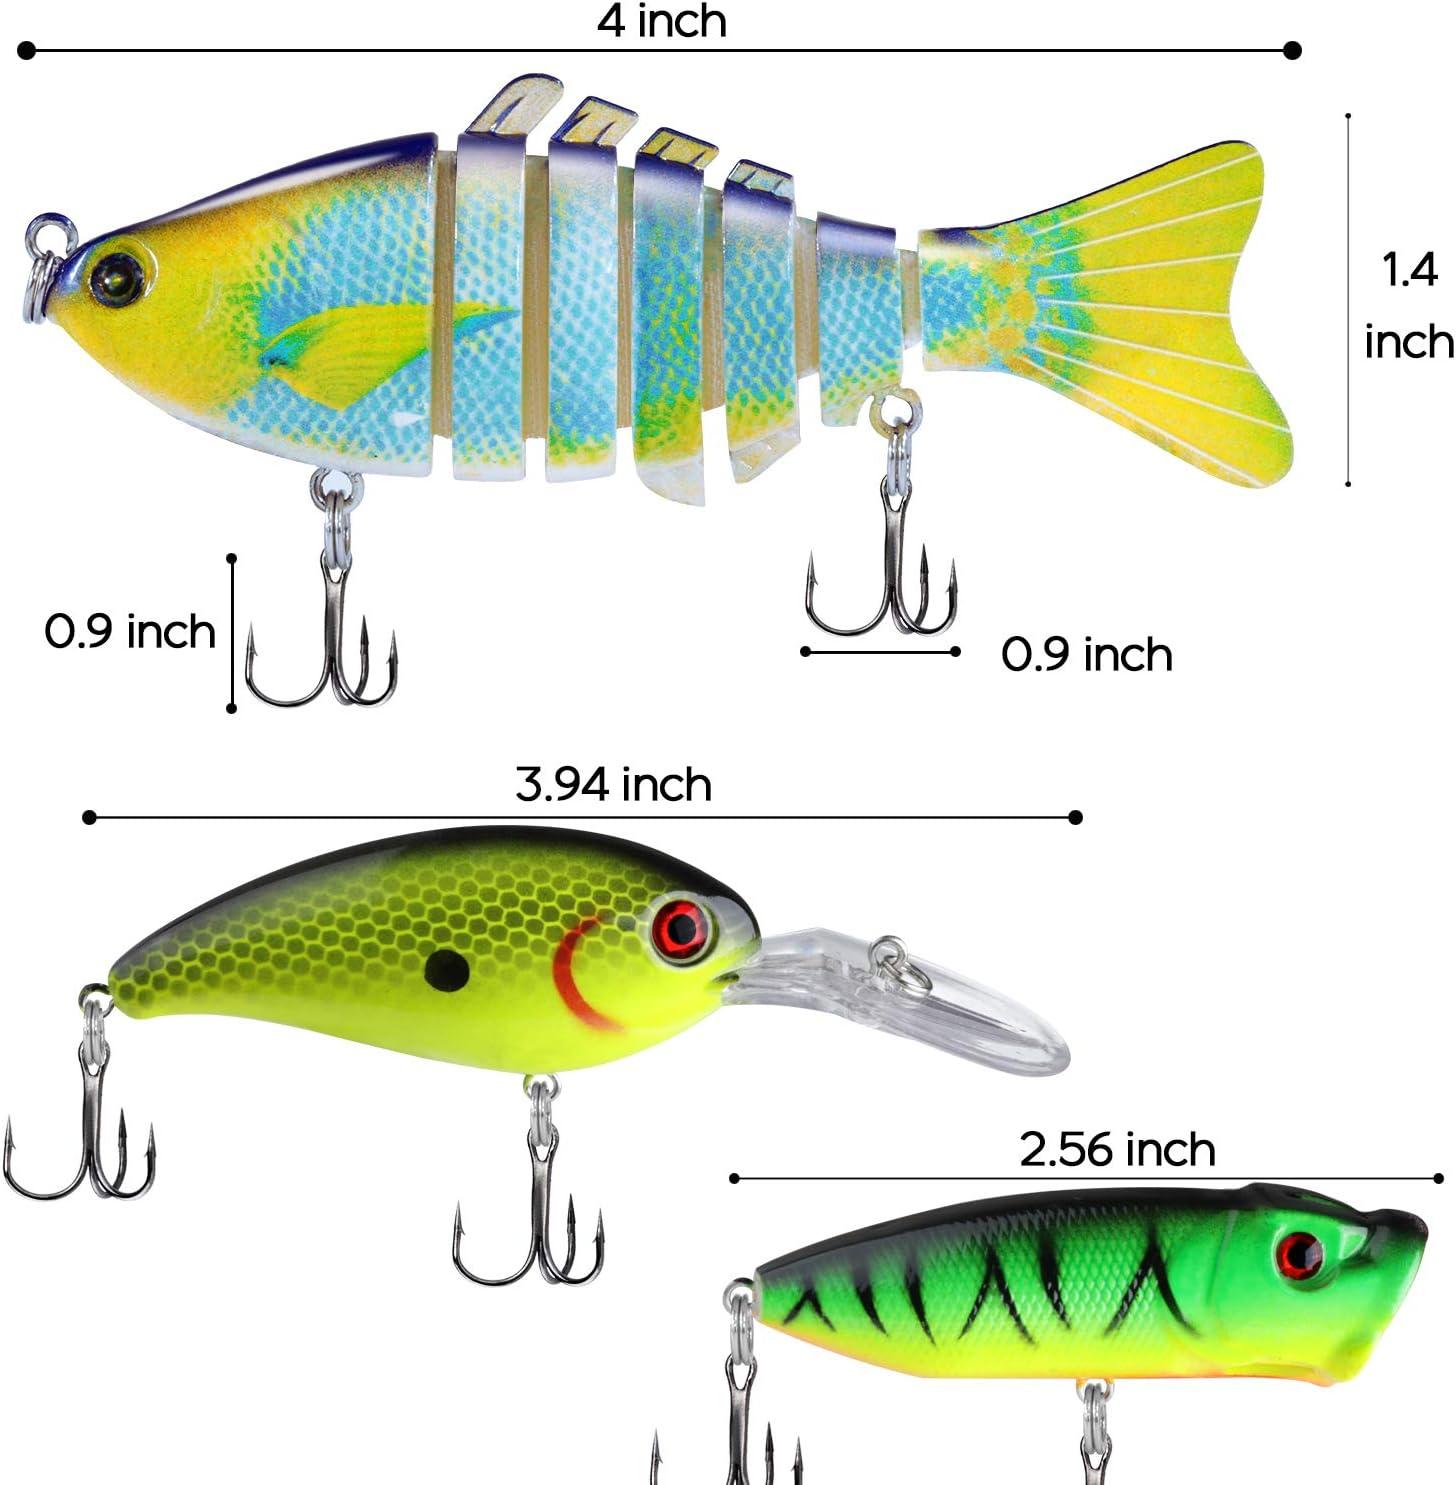 3g 6g Metal Mini Ice Fishing Lure Lead Copper Lures Hard Bait Artificial de Q6X1